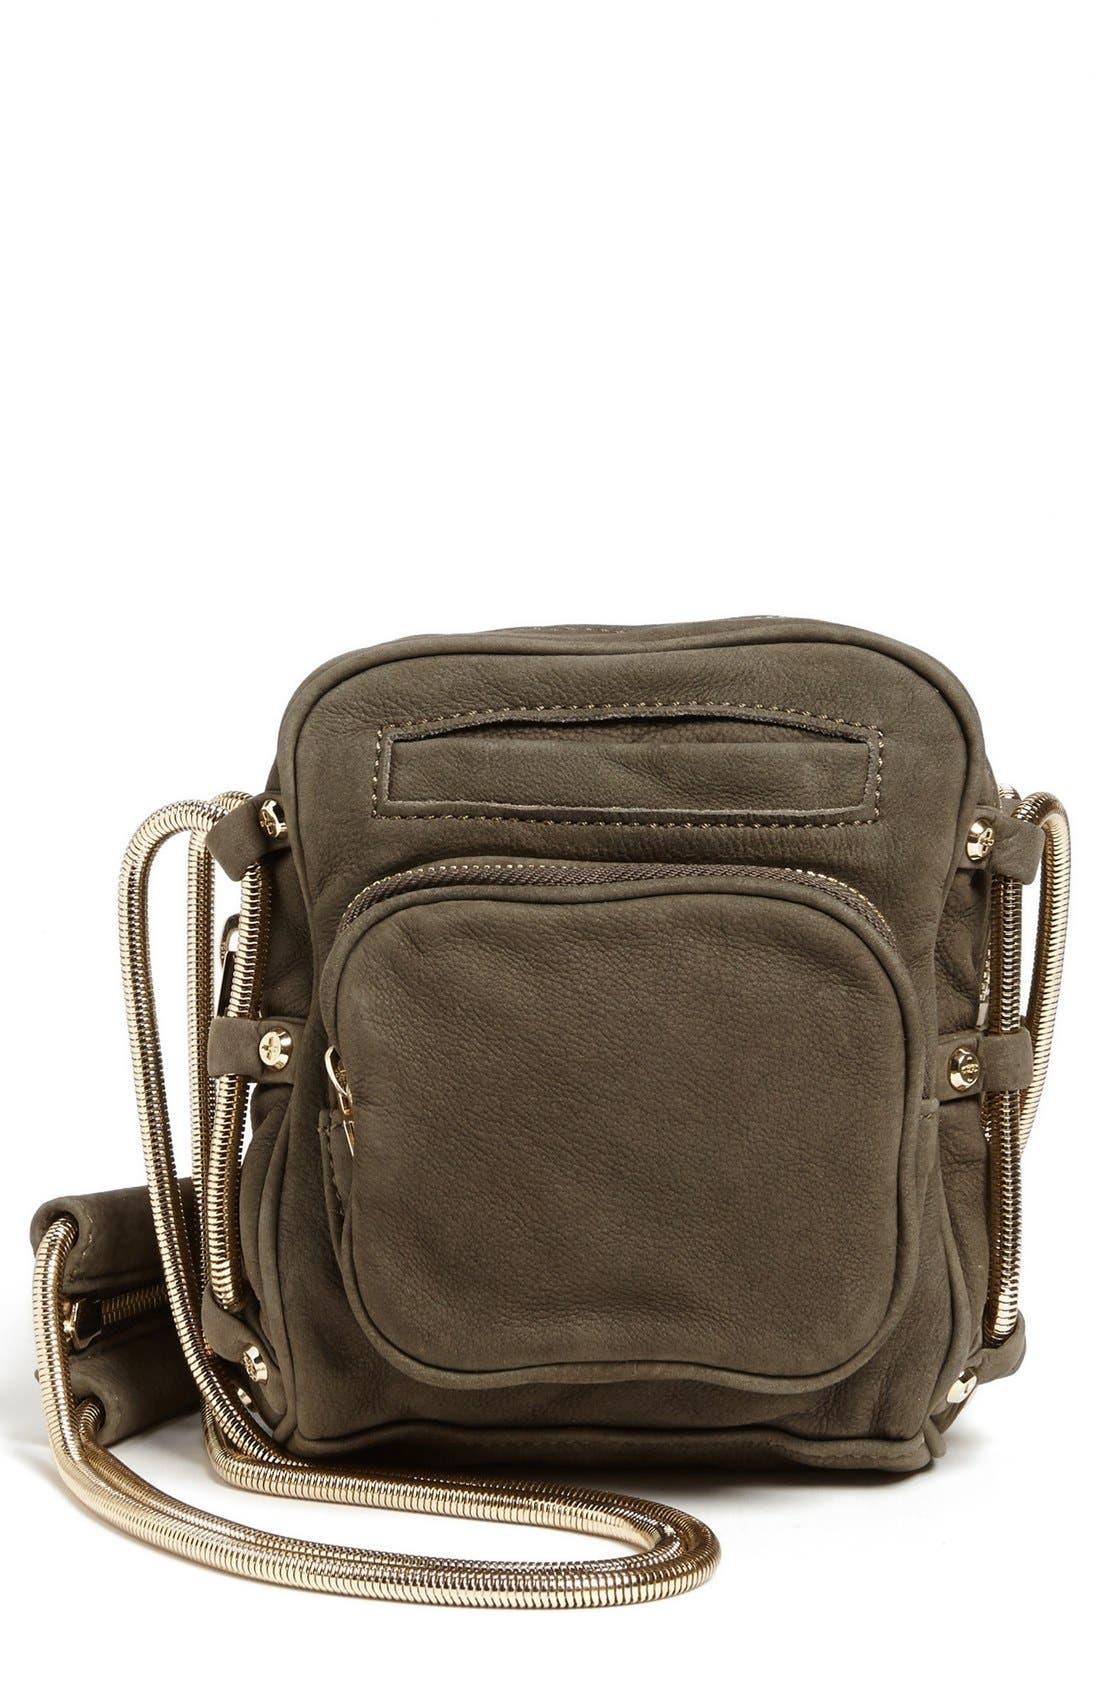 Main Image - Alexander Wang 'Brenda - Pale Gold' Nubuck Leather Shoulder Bag, Small